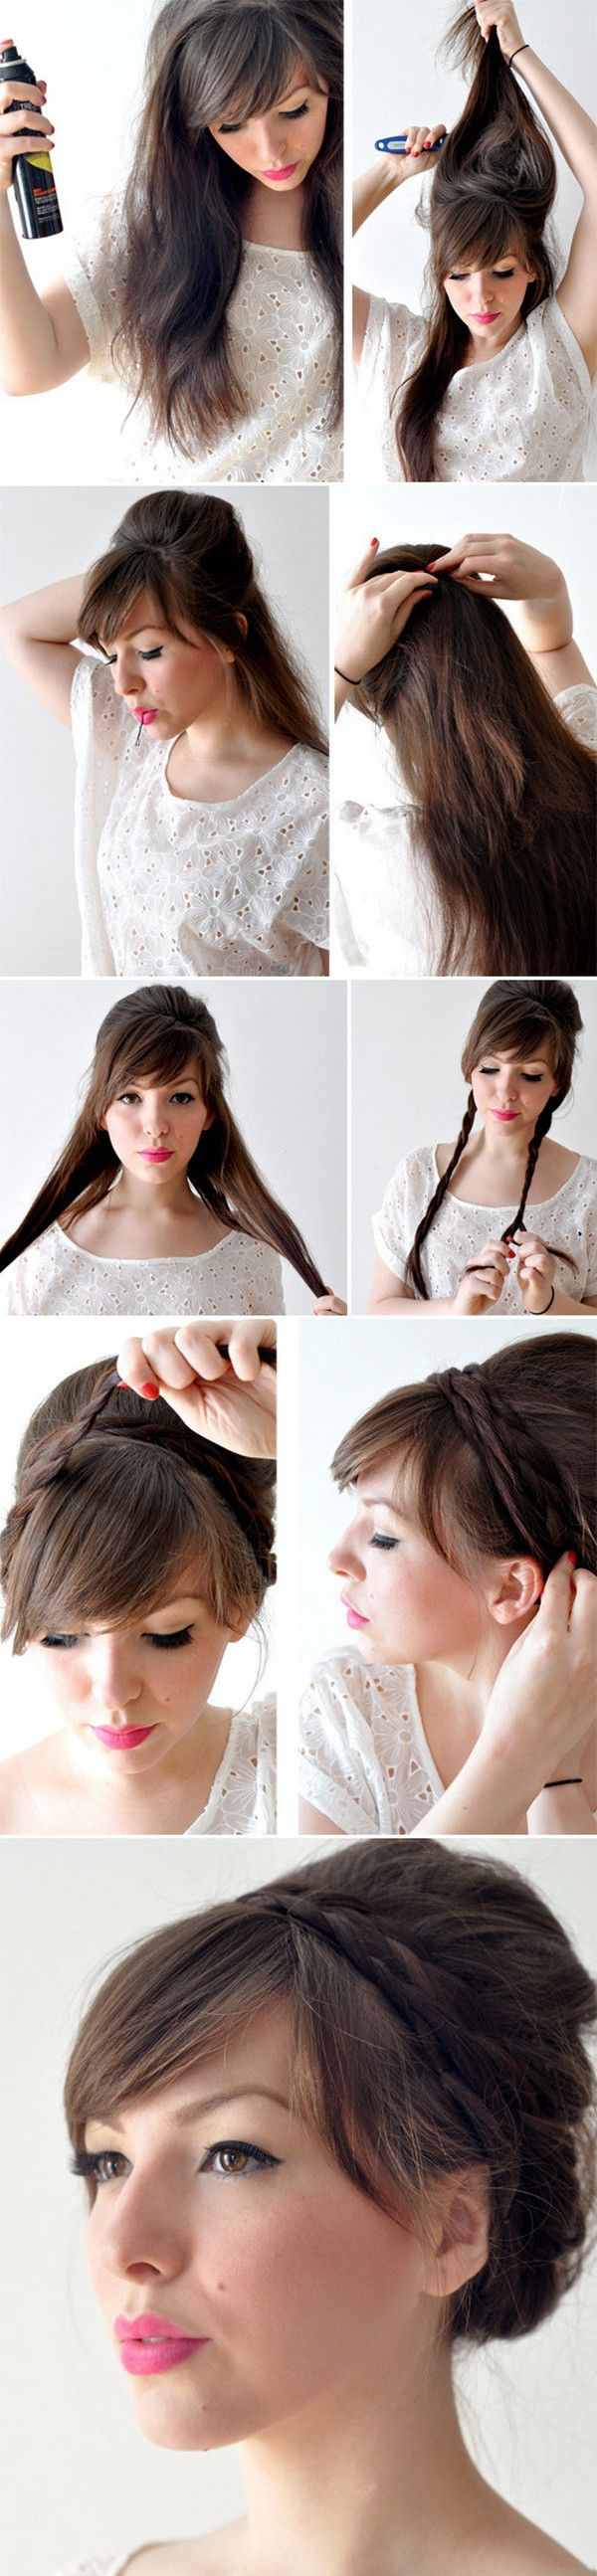 Tuto coiffure avec frange